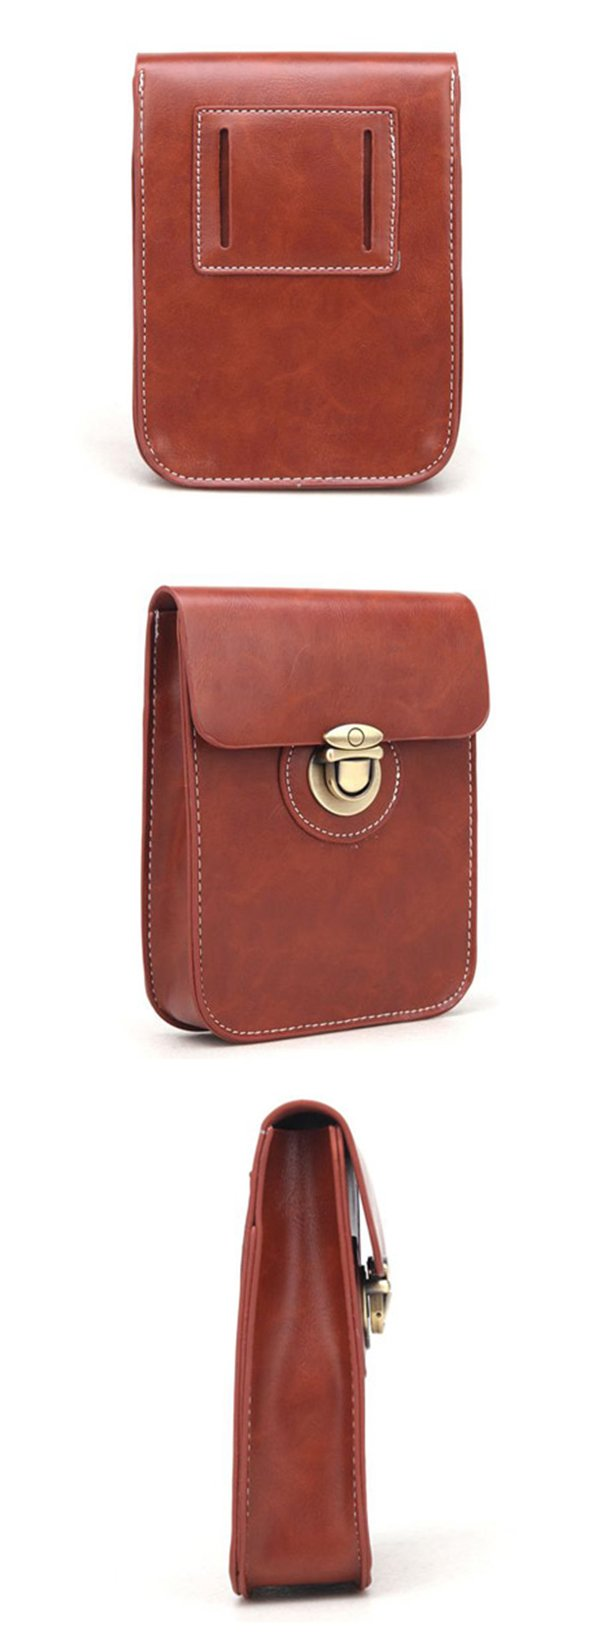 Woman Girl Purse Bag Pocket Fanny Pack Mini Wallet Purse Phone Bag Waist Casual Bag Alleviate Burdens on Shoulder Bag for Travel (Brown)